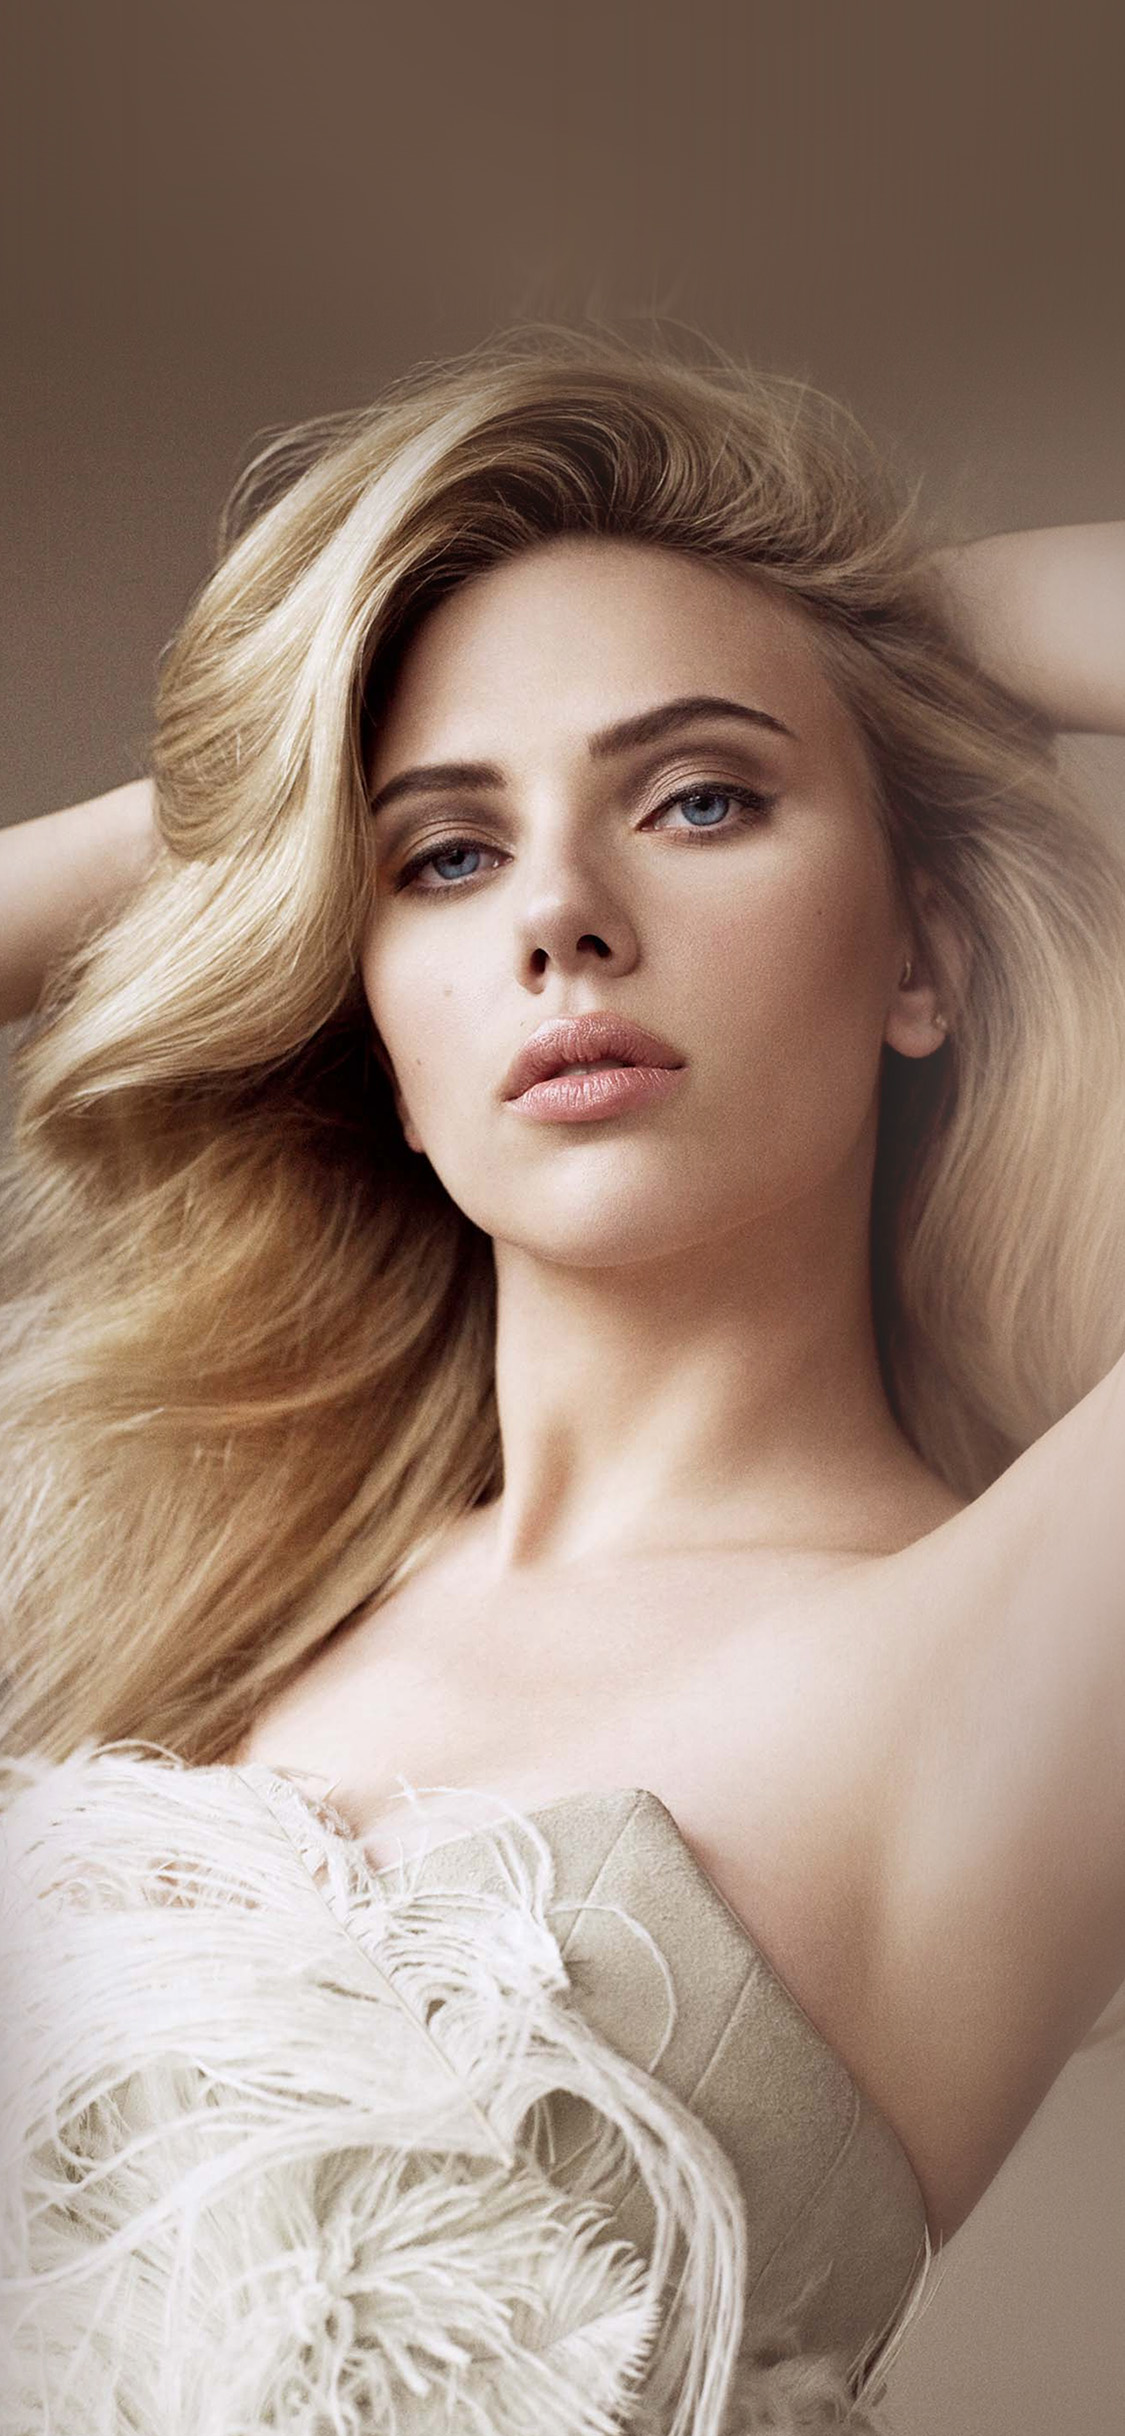 iPhonexpapers.com-Apple-iPhone-wallpaper-hq21-girl-scarlett-johanson-film-dress-hero